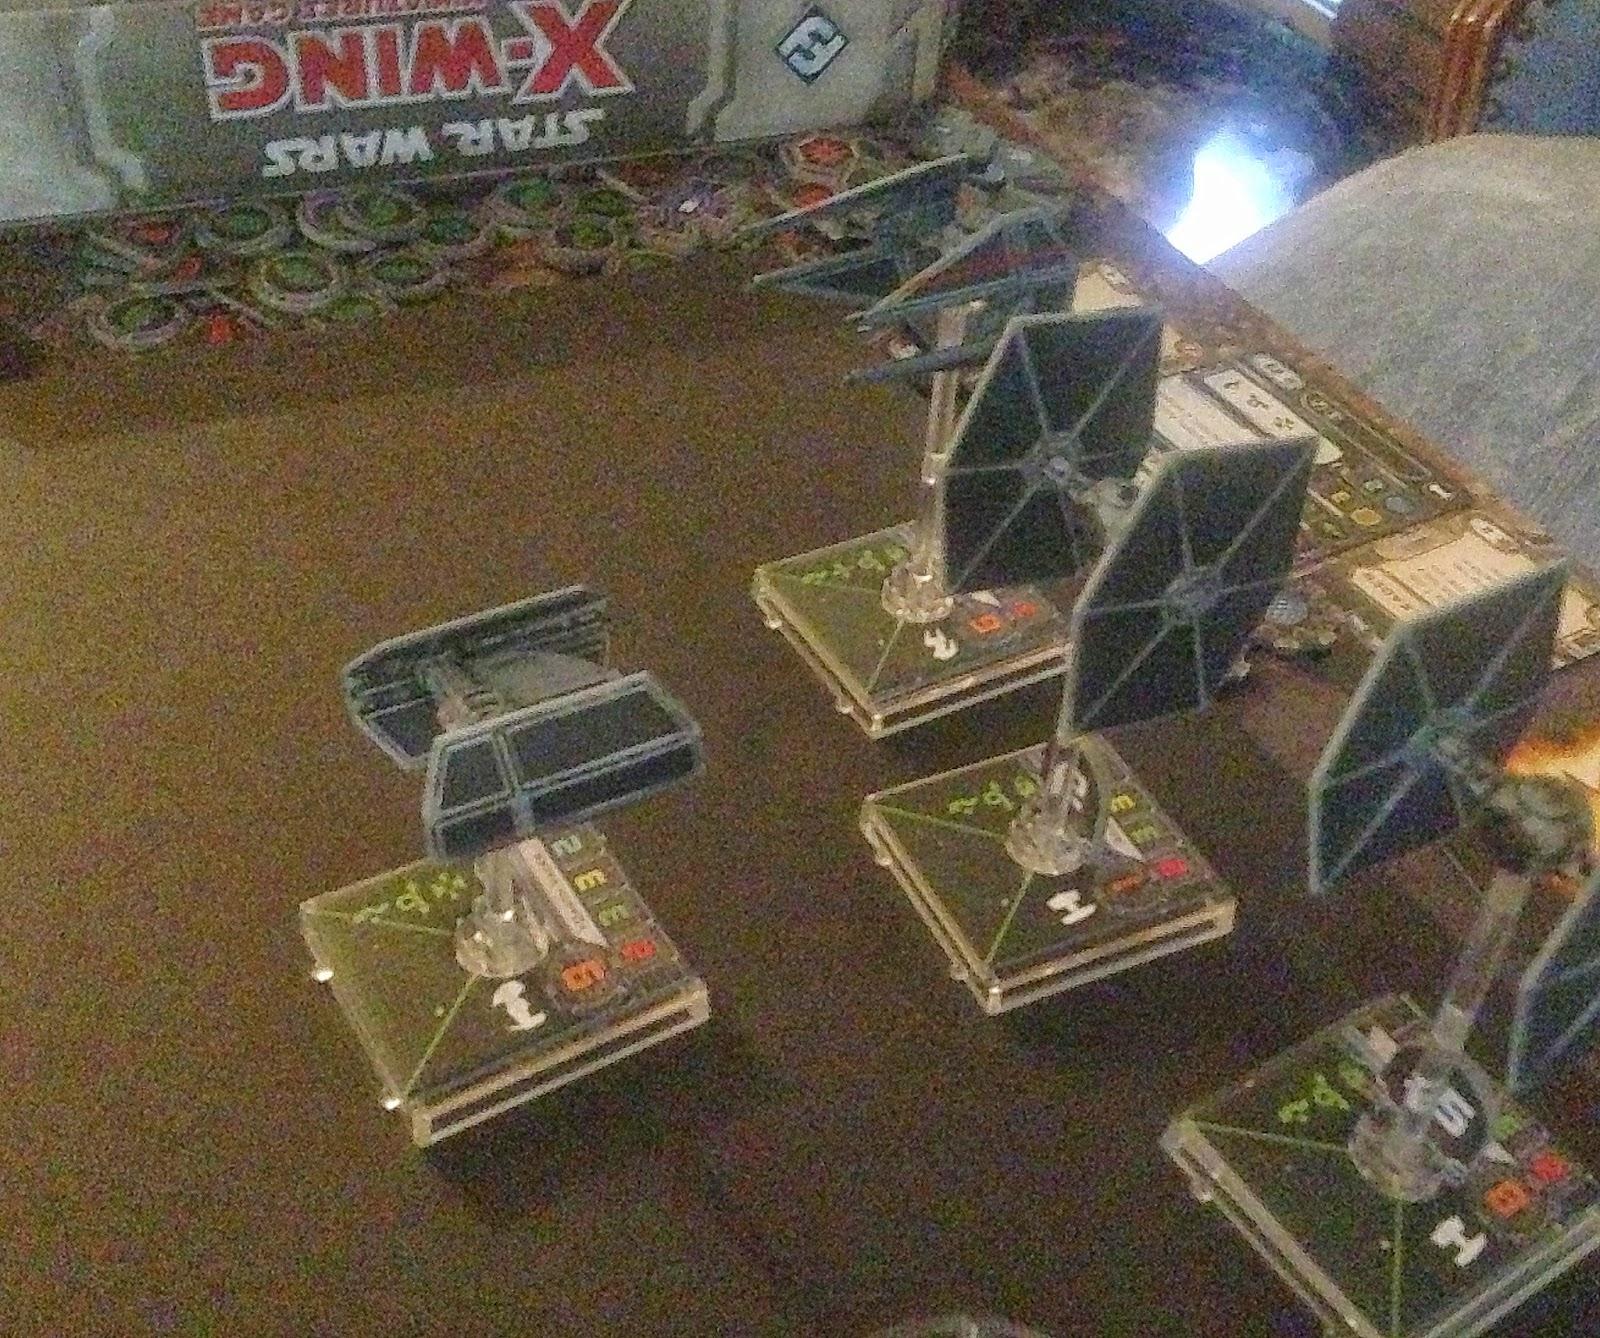 Darth's TIE Advanced, X-wing, Death Star, Battle Gaming One